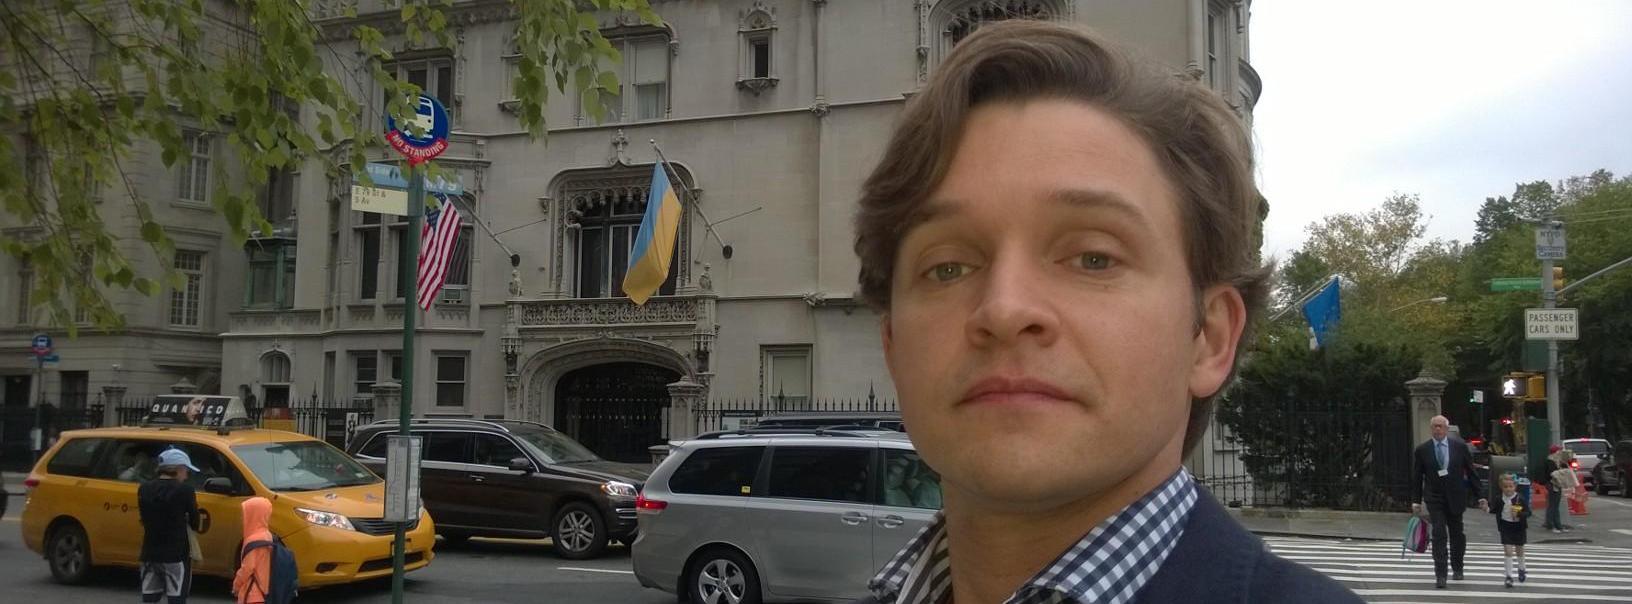 Евгений Толочин